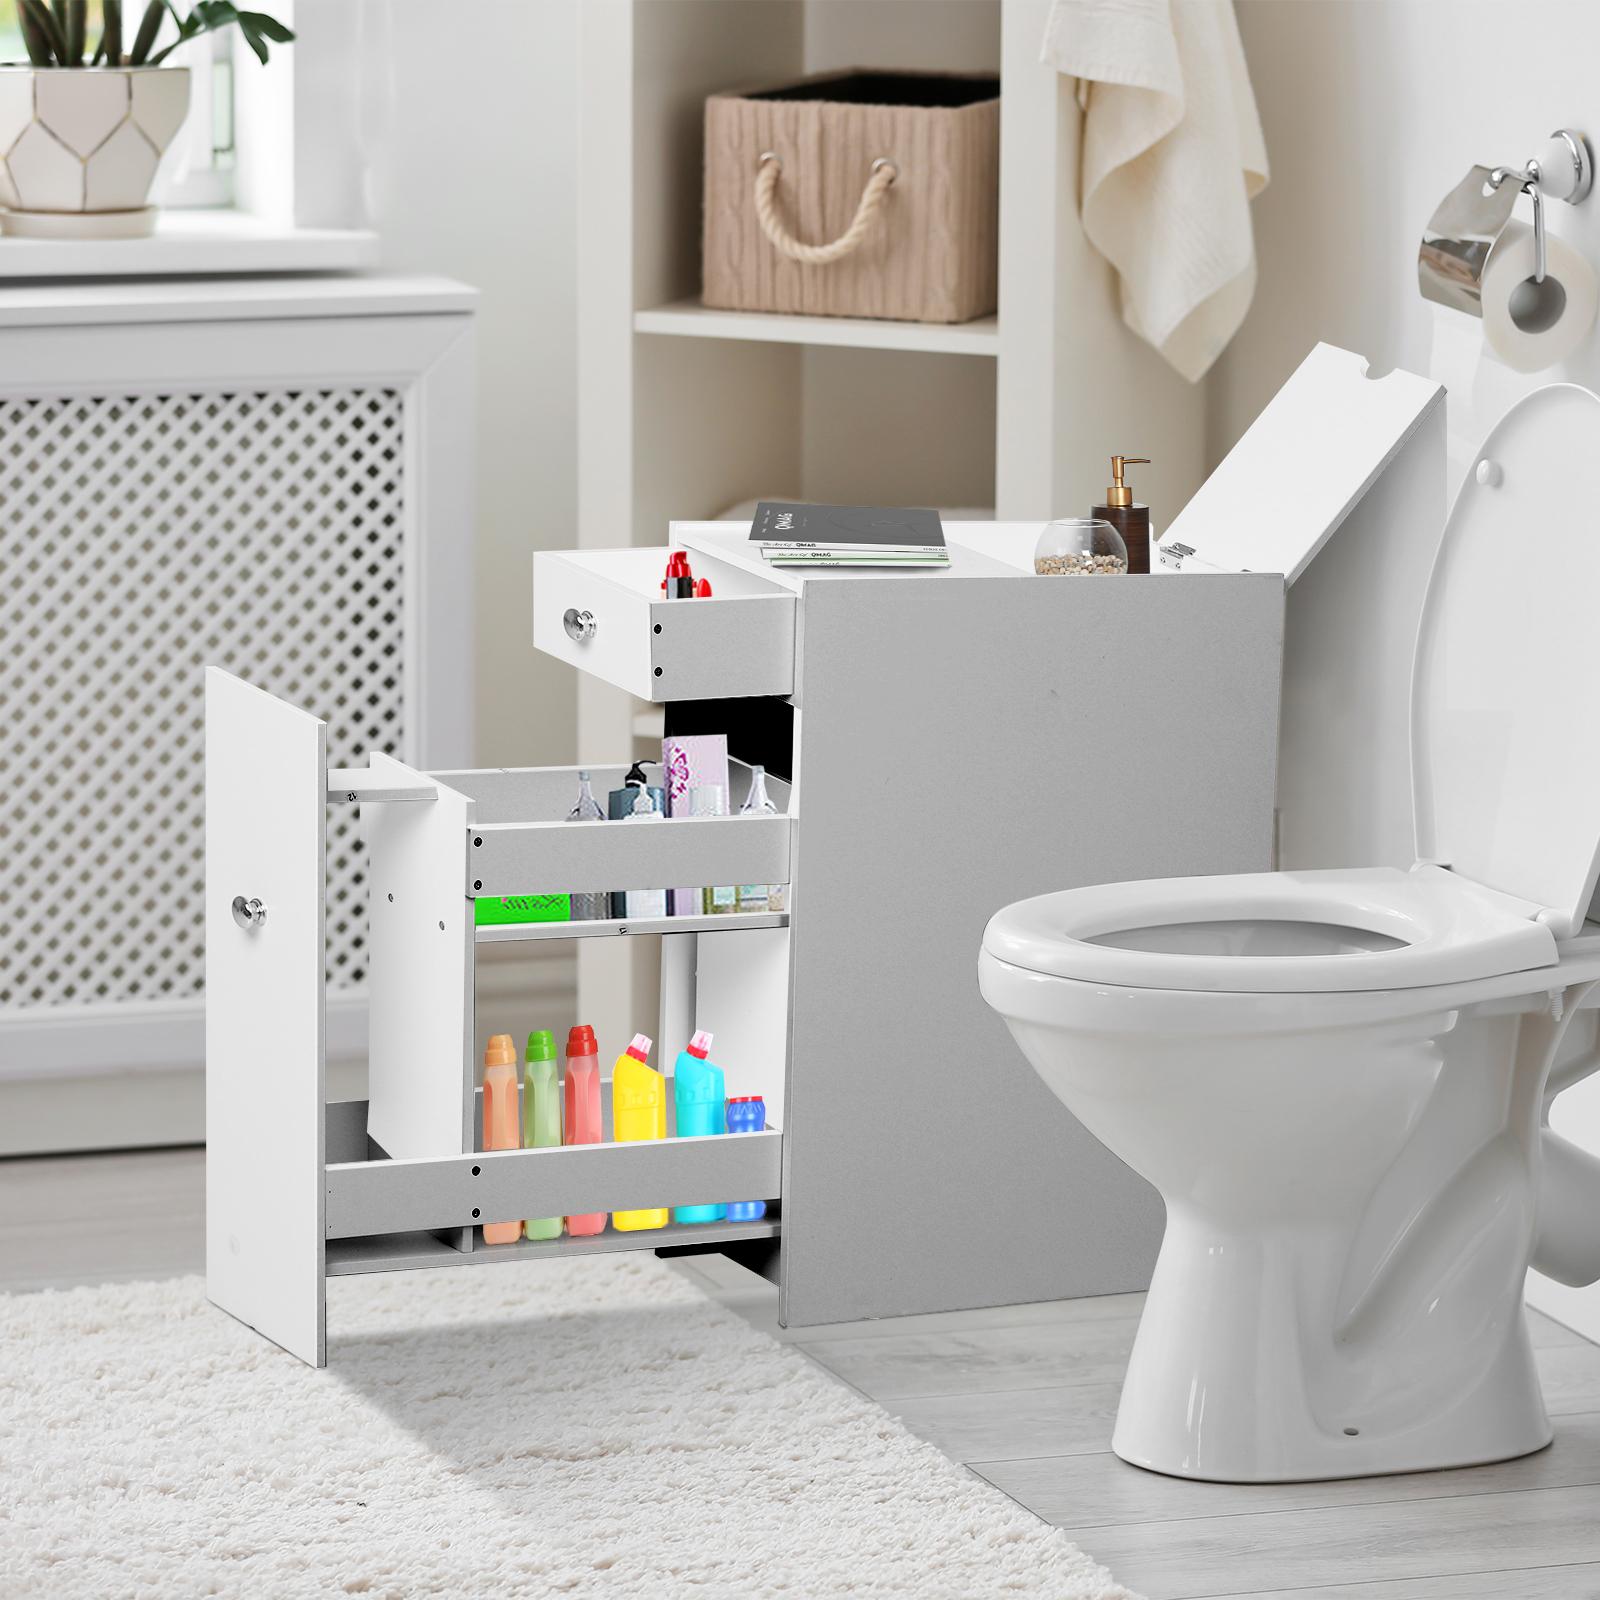 Groovy Details About Homcom Bathroom Floor Organizer Freestanding Space Saving Narrow Storage Cabinet Interior Design Ideas Skatsoteloinfo